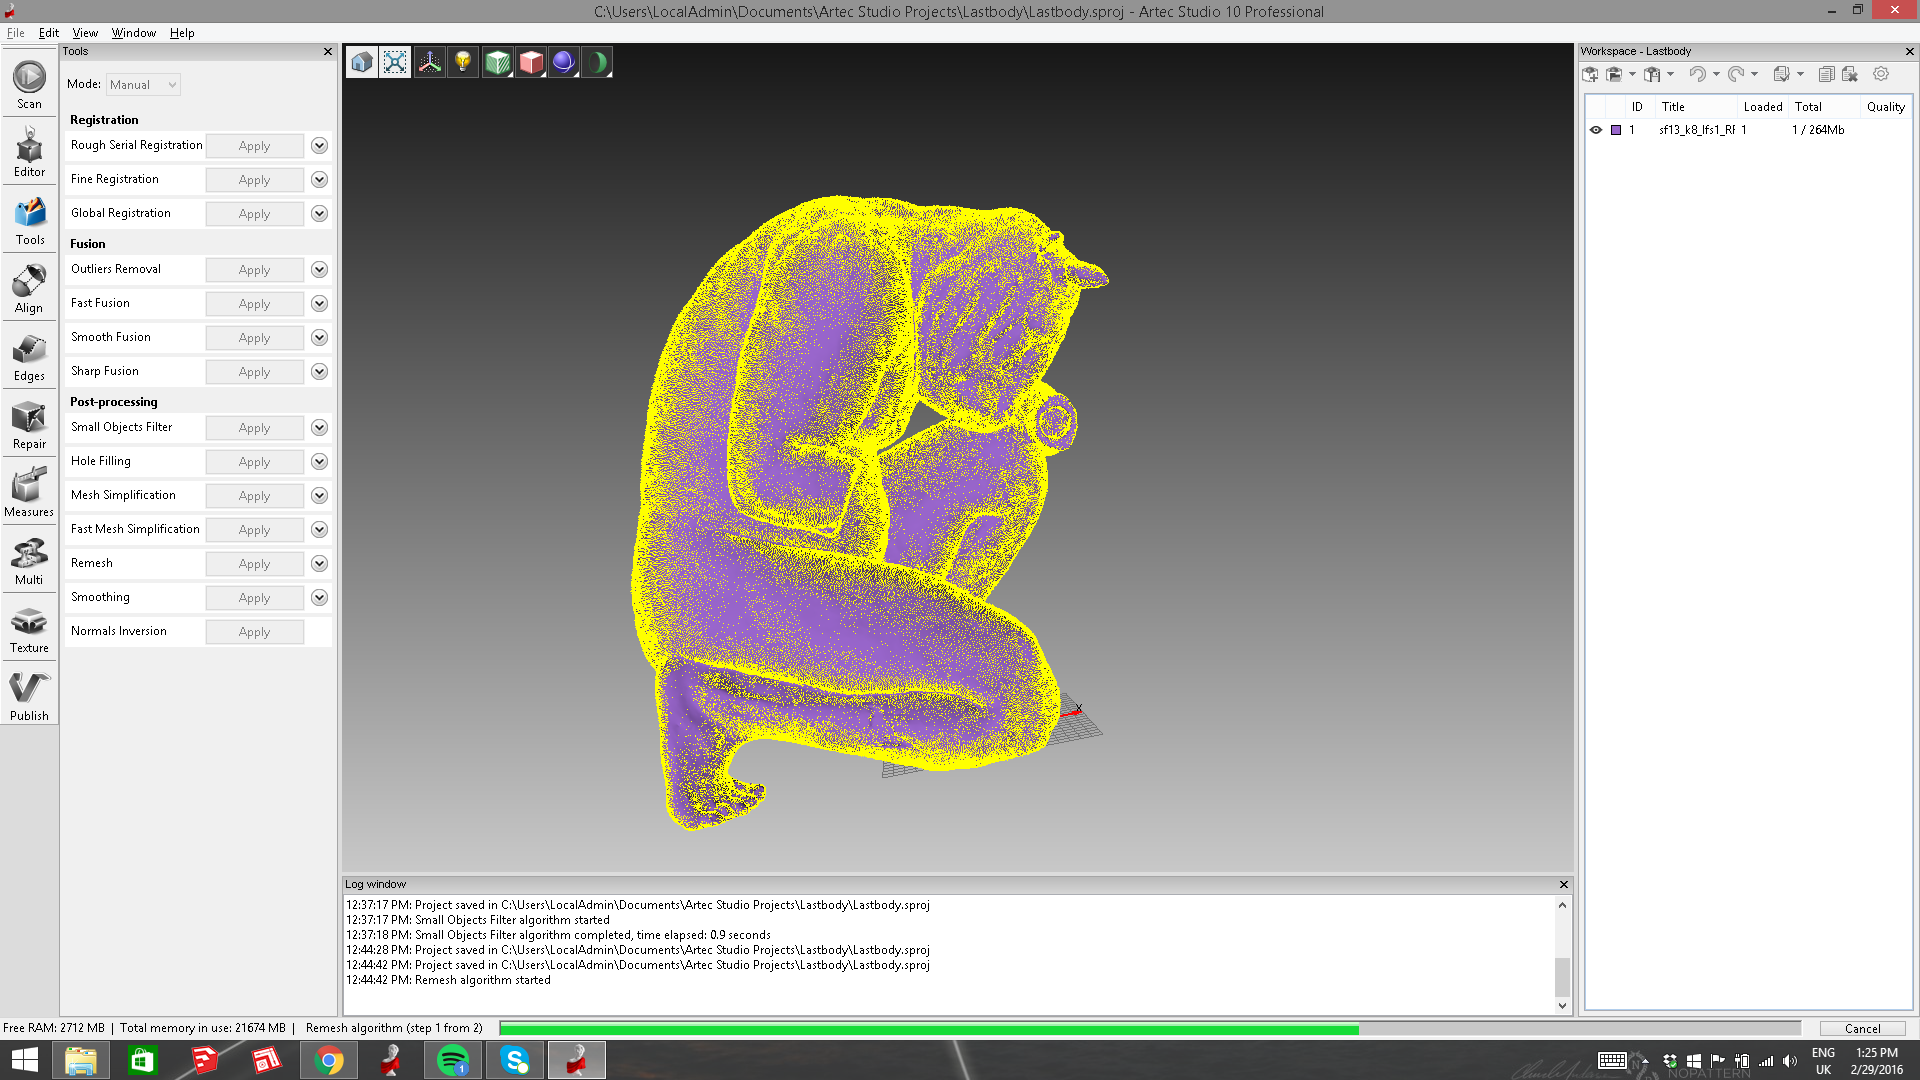 Minotaur scan data